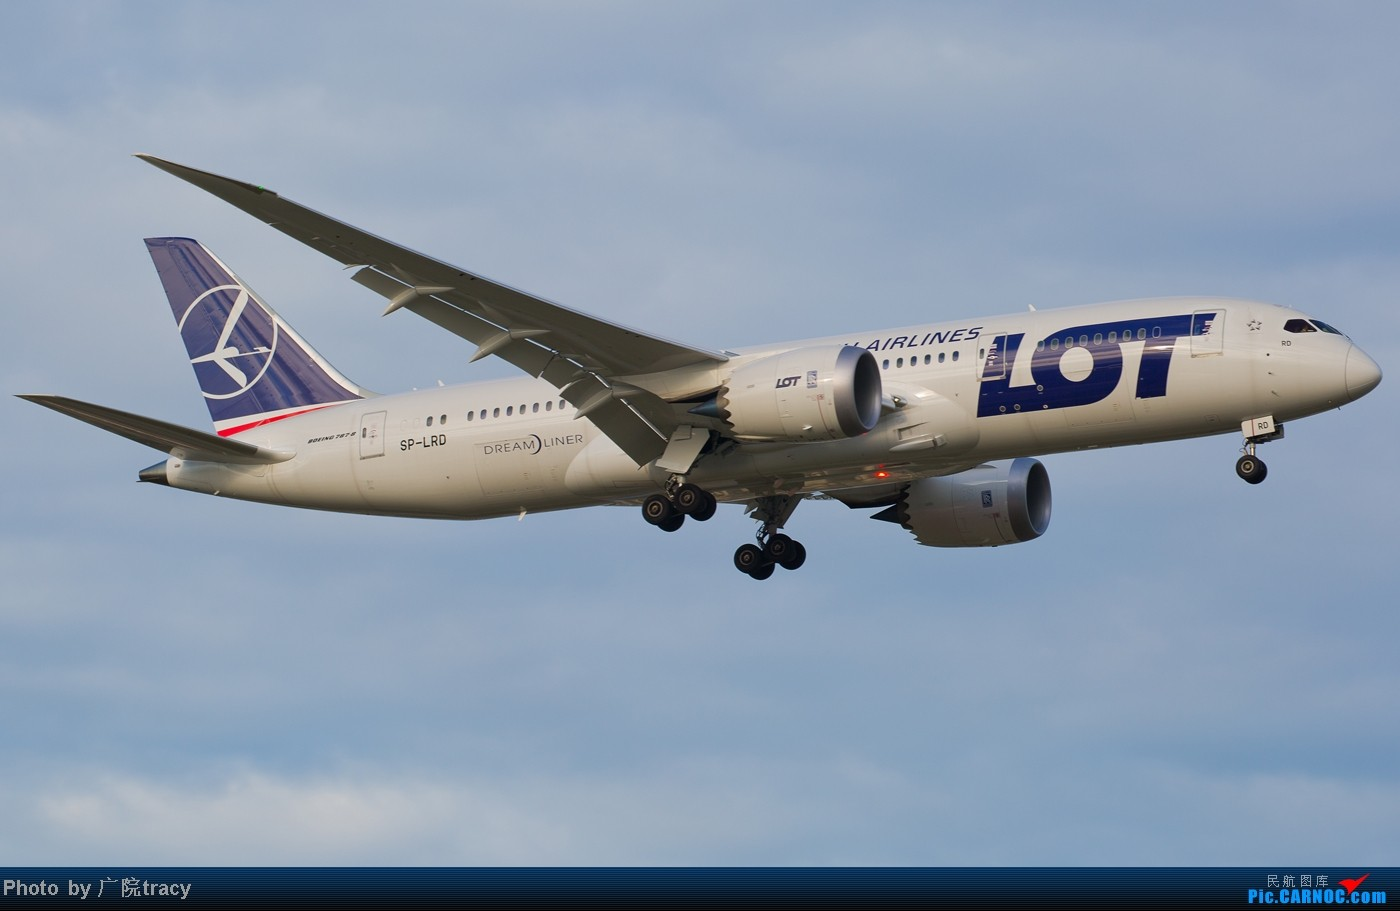 Re:[原创]★ ★ ★ ★ ★目前已经拍到了9家航空公司的波音787梦想客机★ ★ ★ ★ ★ BOEING 787-8 SP-LRD 中国北京首都机场